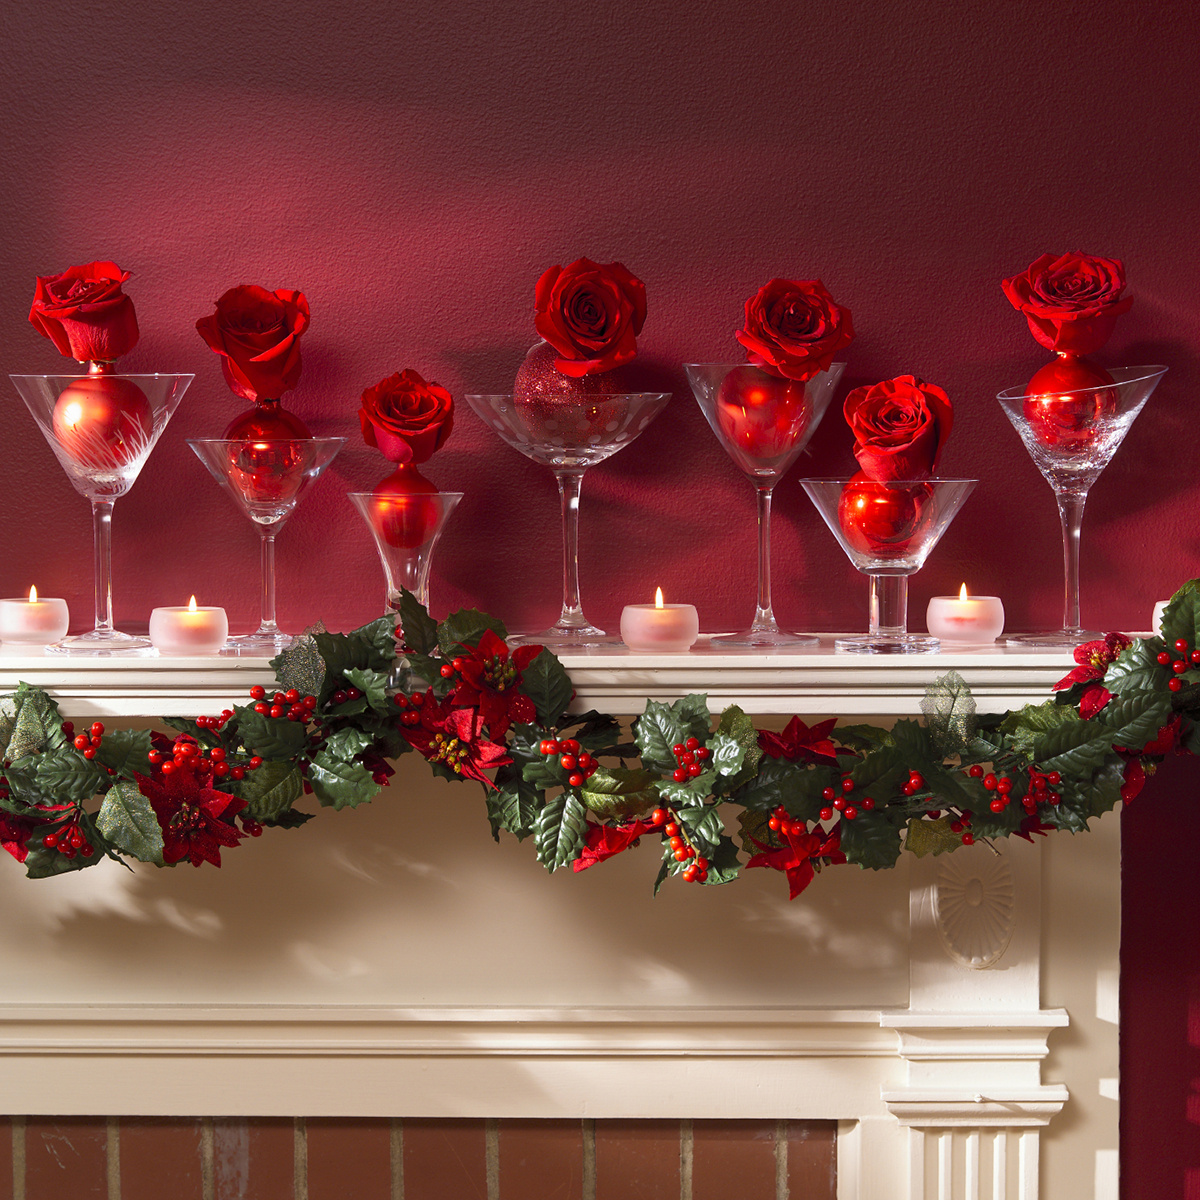 Christmas Mantel Decorating Ideas -   Christmas Decorating Ideas